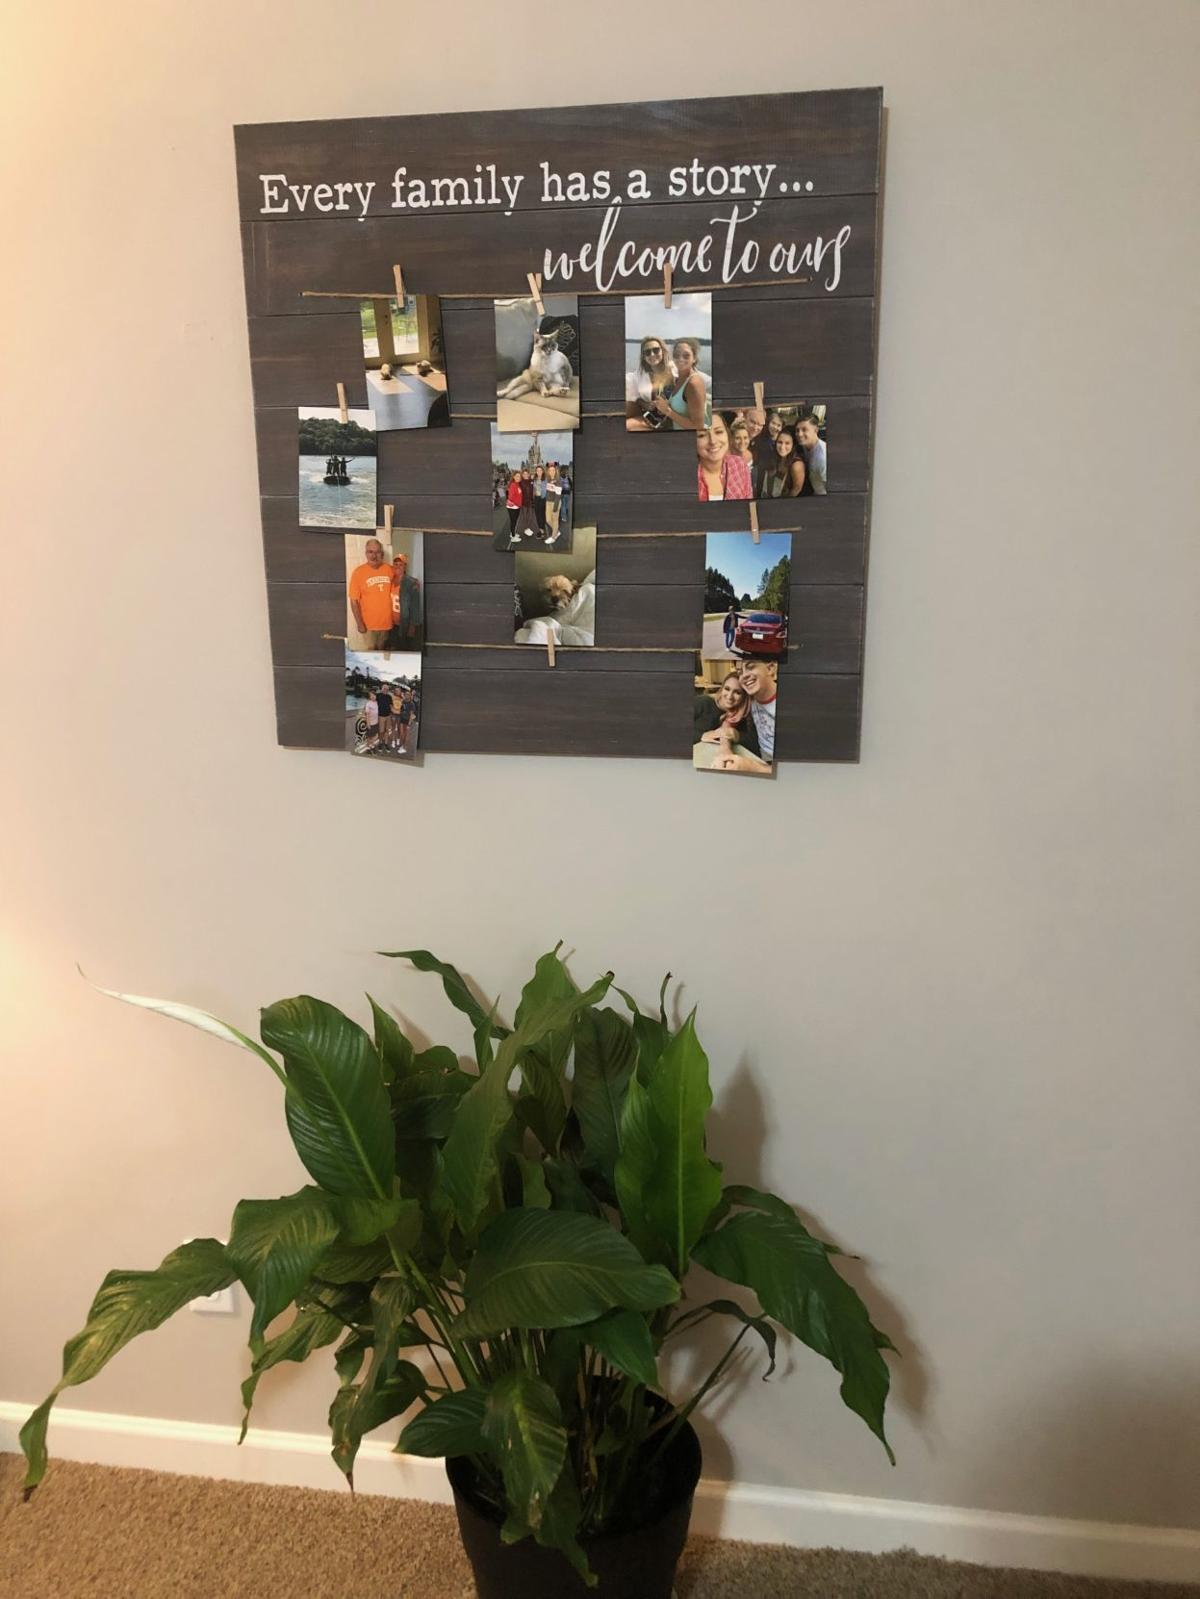 Radoseviches' Airbnb